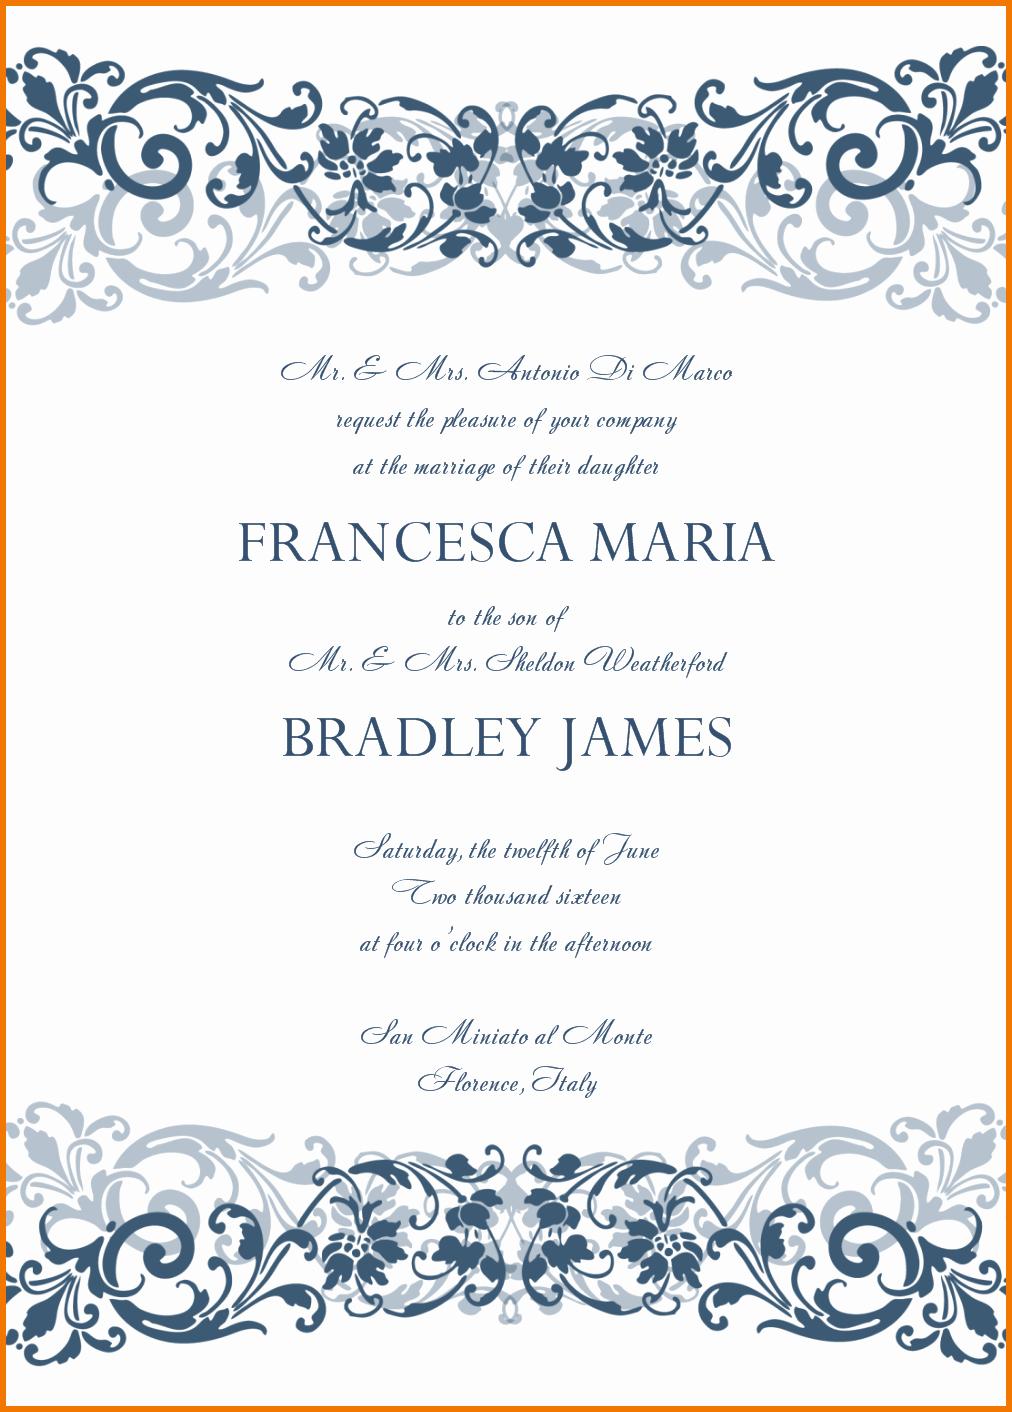 Microsoft Office Wedding Invitation Template Luxury Free Invitation Templates for Microsoft Word